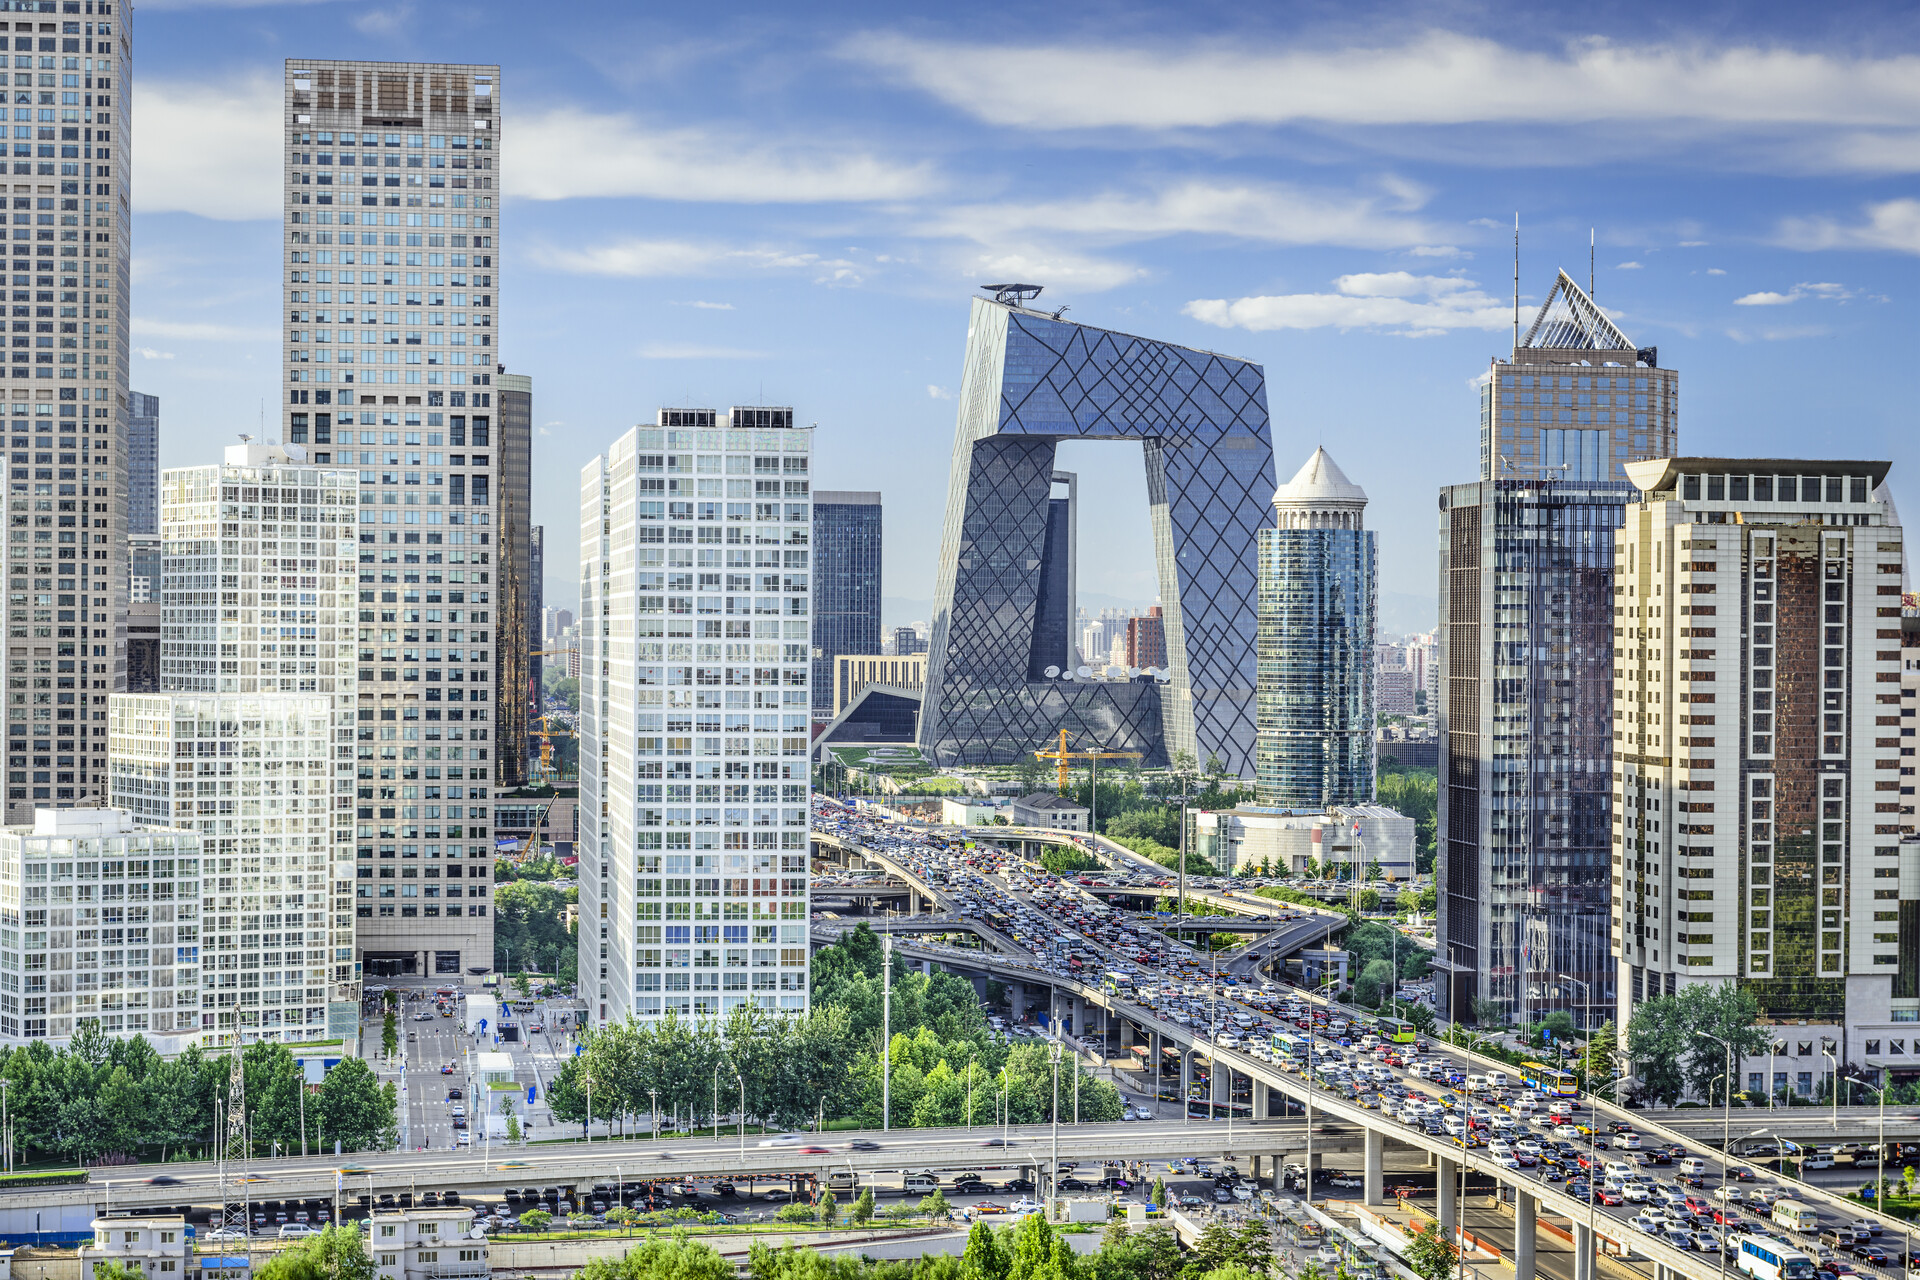 china city image